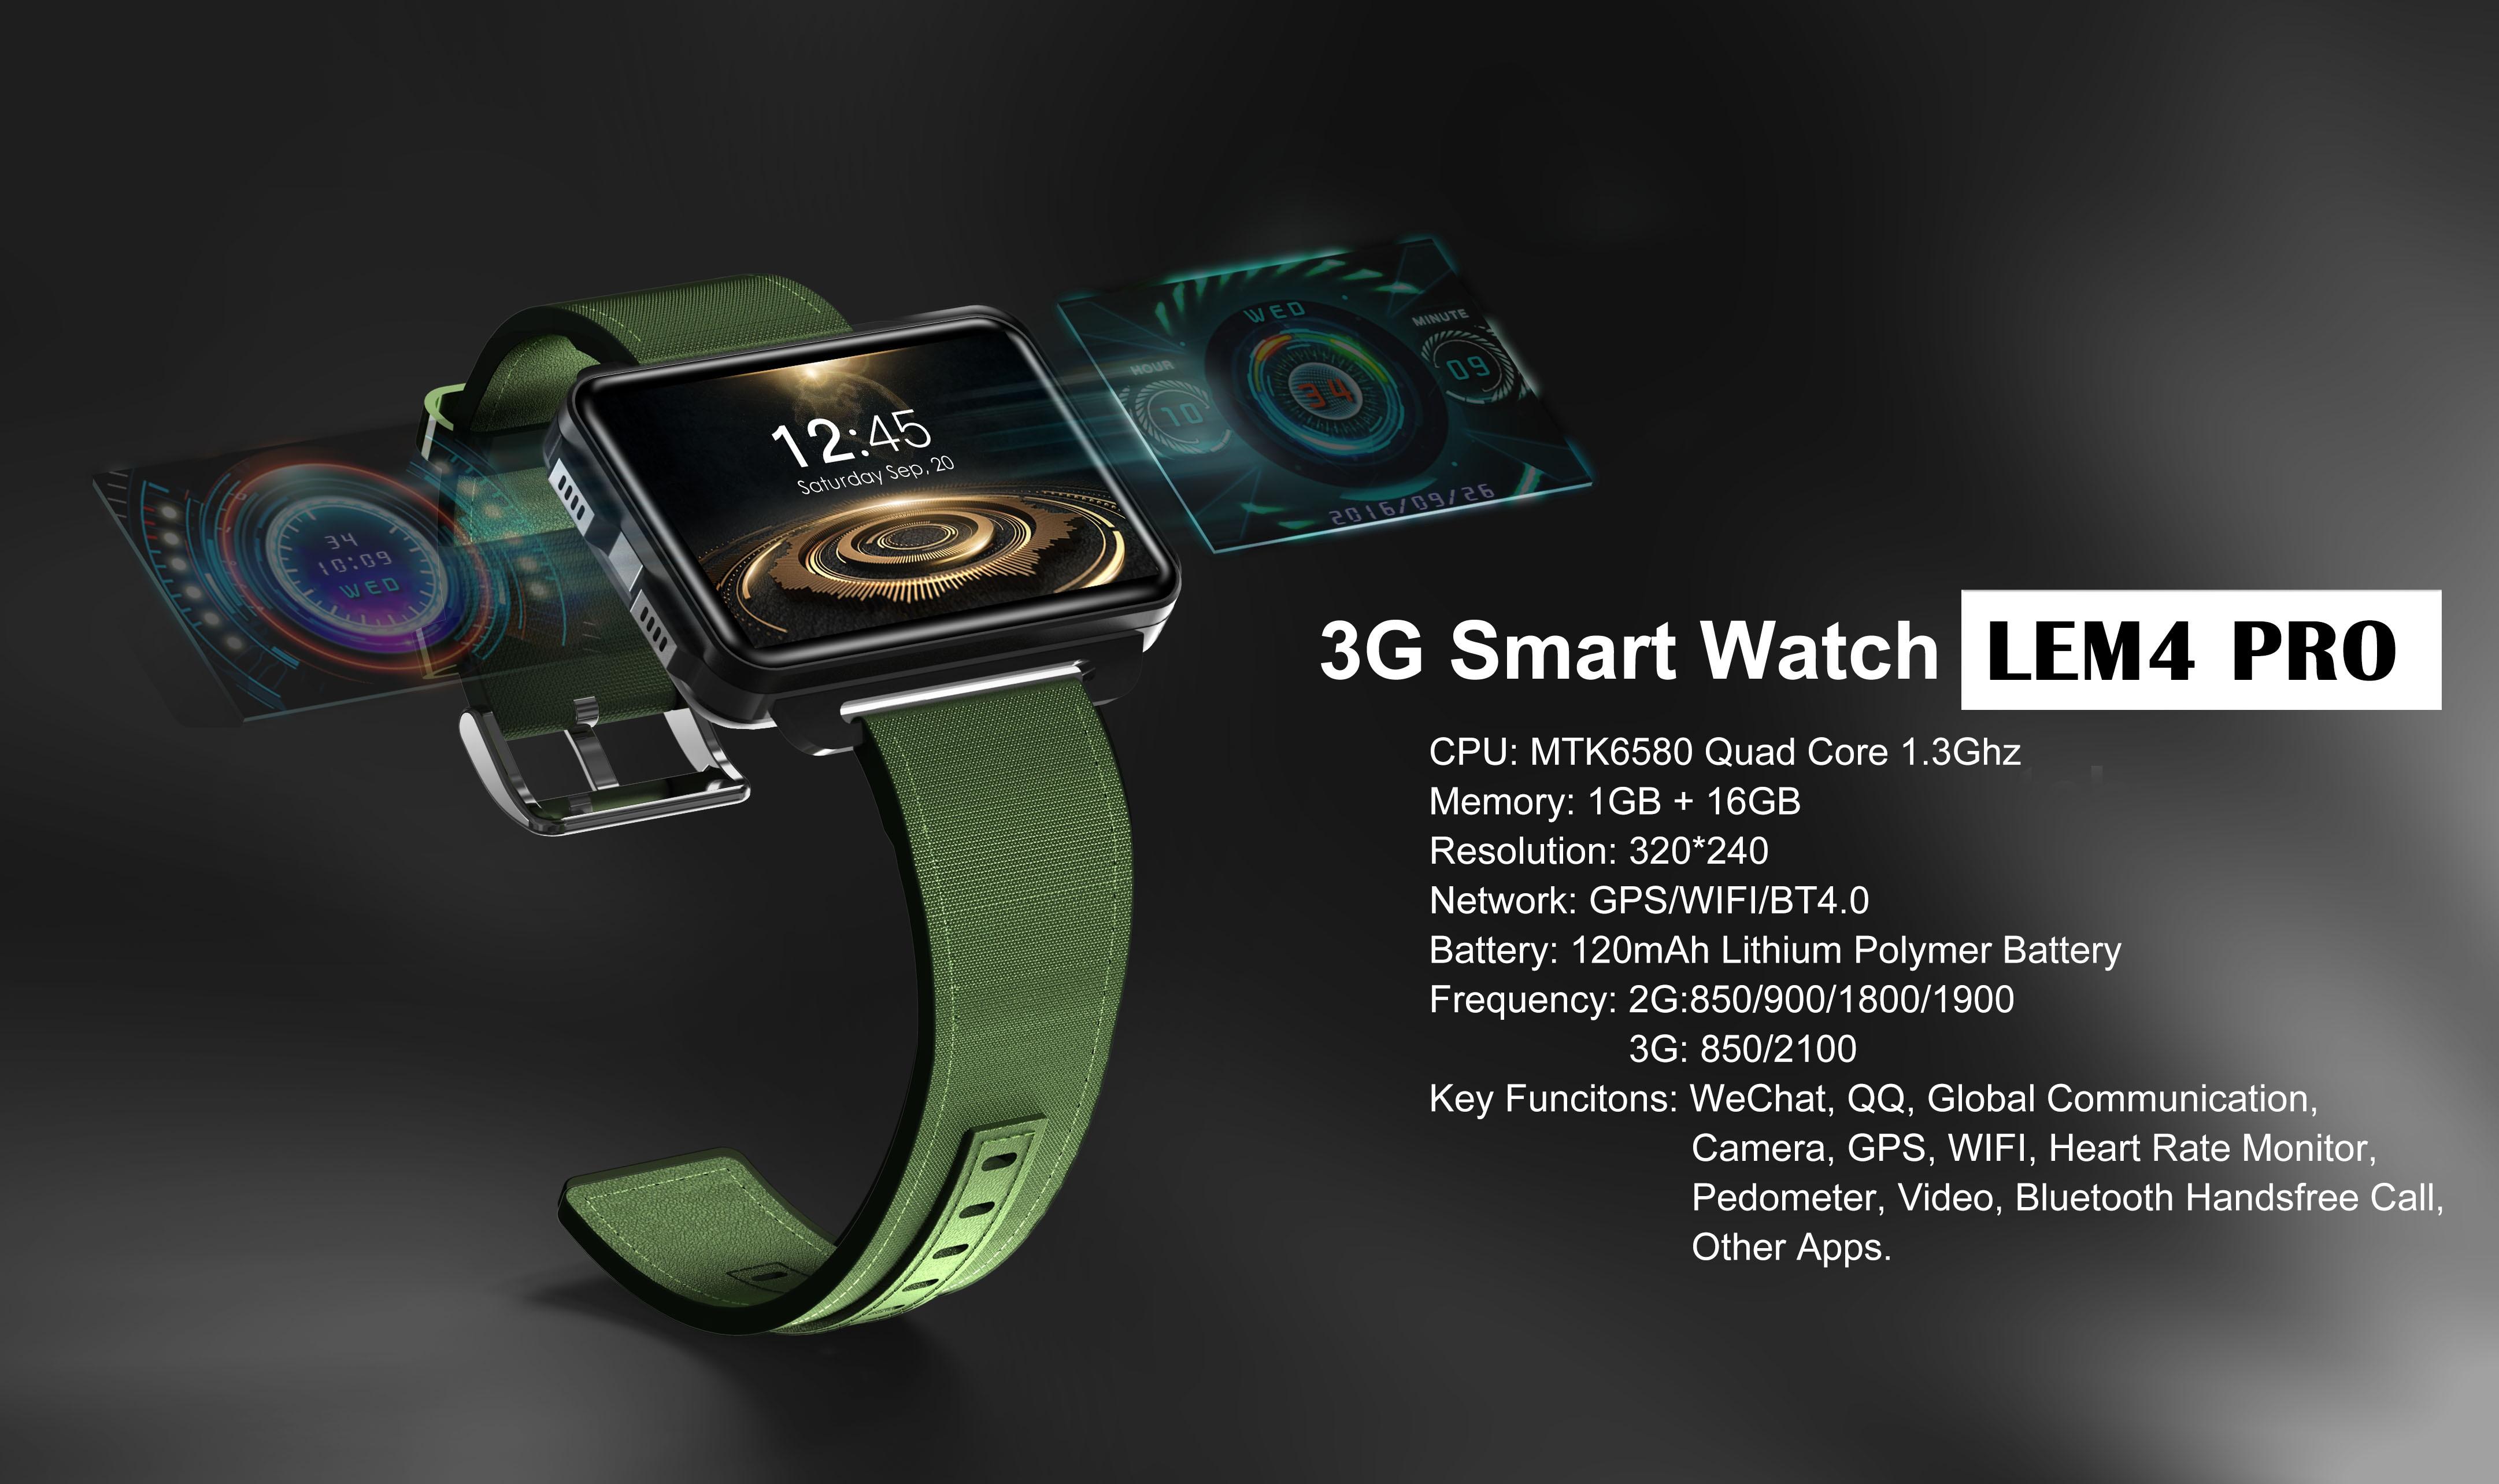 LEMFO LEM4 Pro 2.2 Inch Display 3G Smart Watch Android 5.1 1200mAh Lithium Battery 1GB + 16GB Wifi Take Video Orange - 5